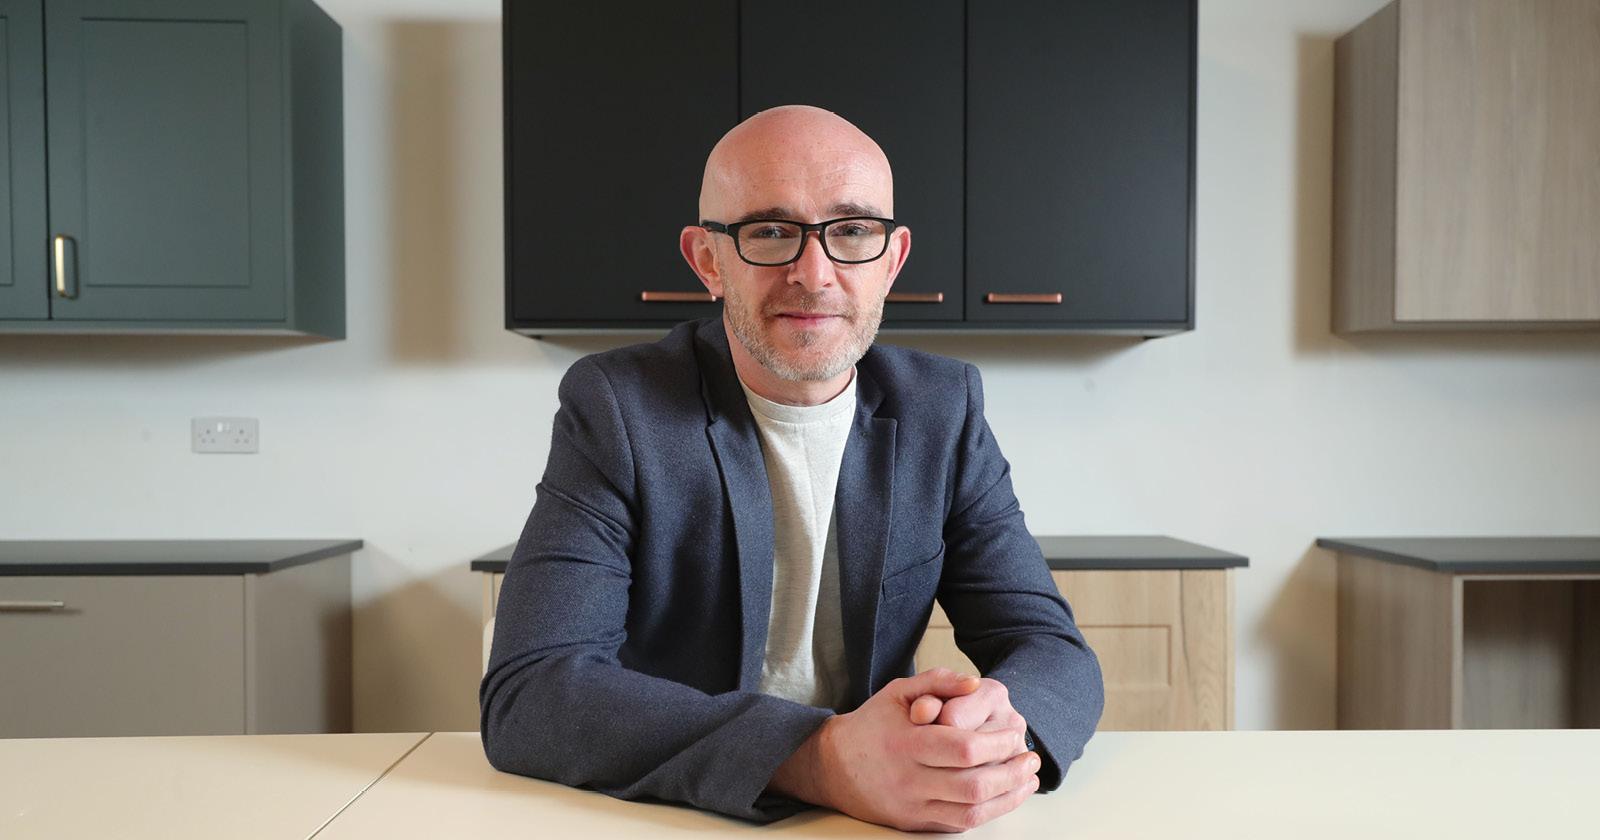 Patrick Bradley has Grand Designs on Blossom Avenue